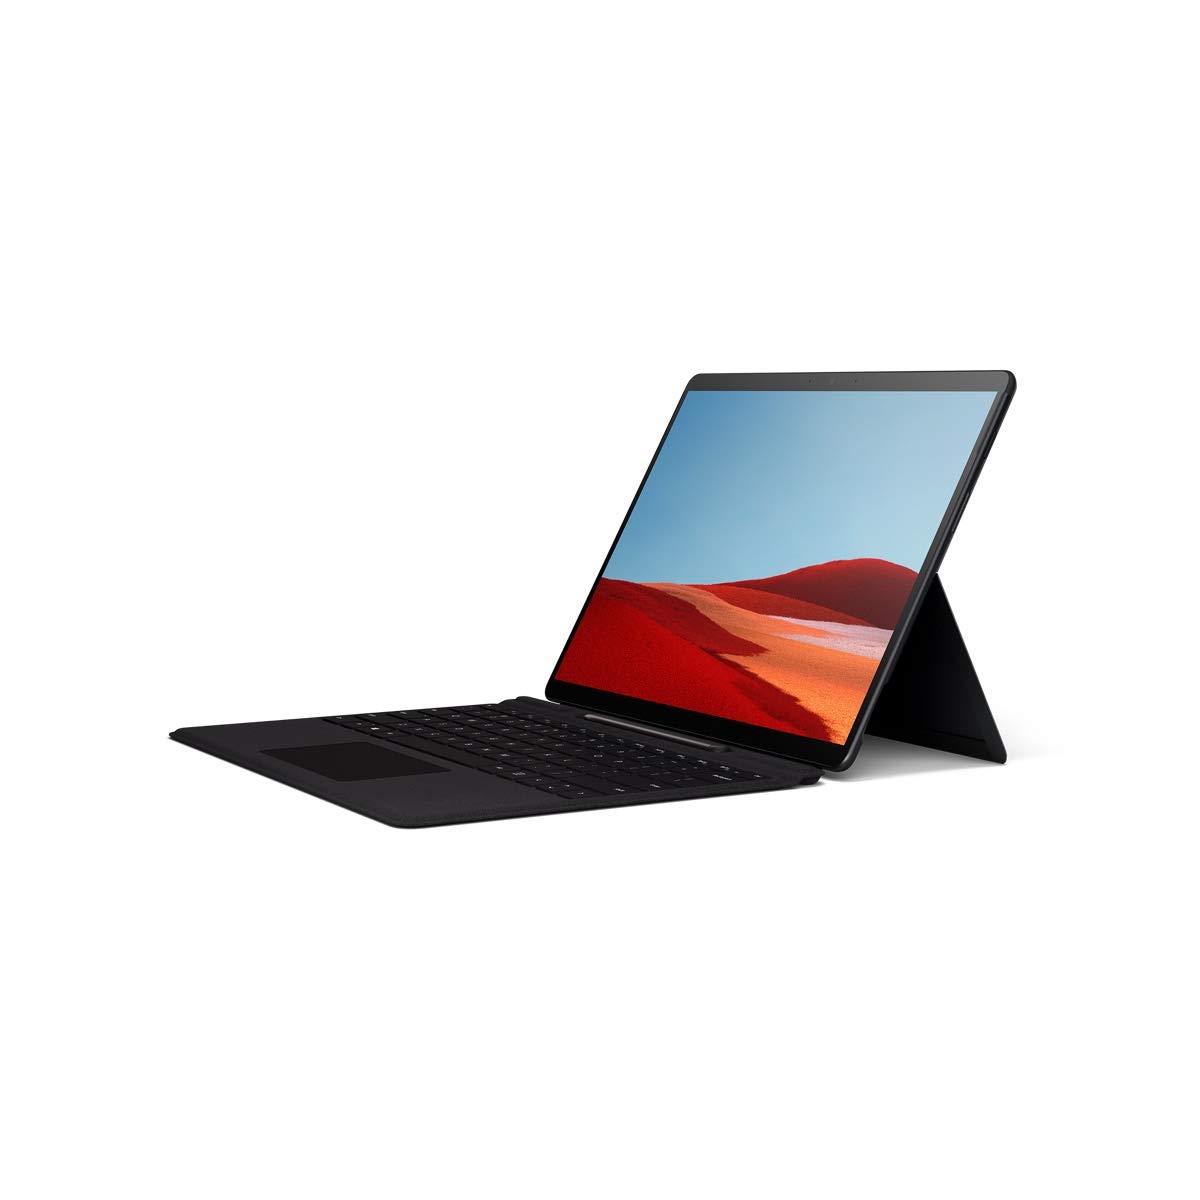 5 Best Laptop Under 100000 In India 2020 microsoft-surface-pro-x.jpg